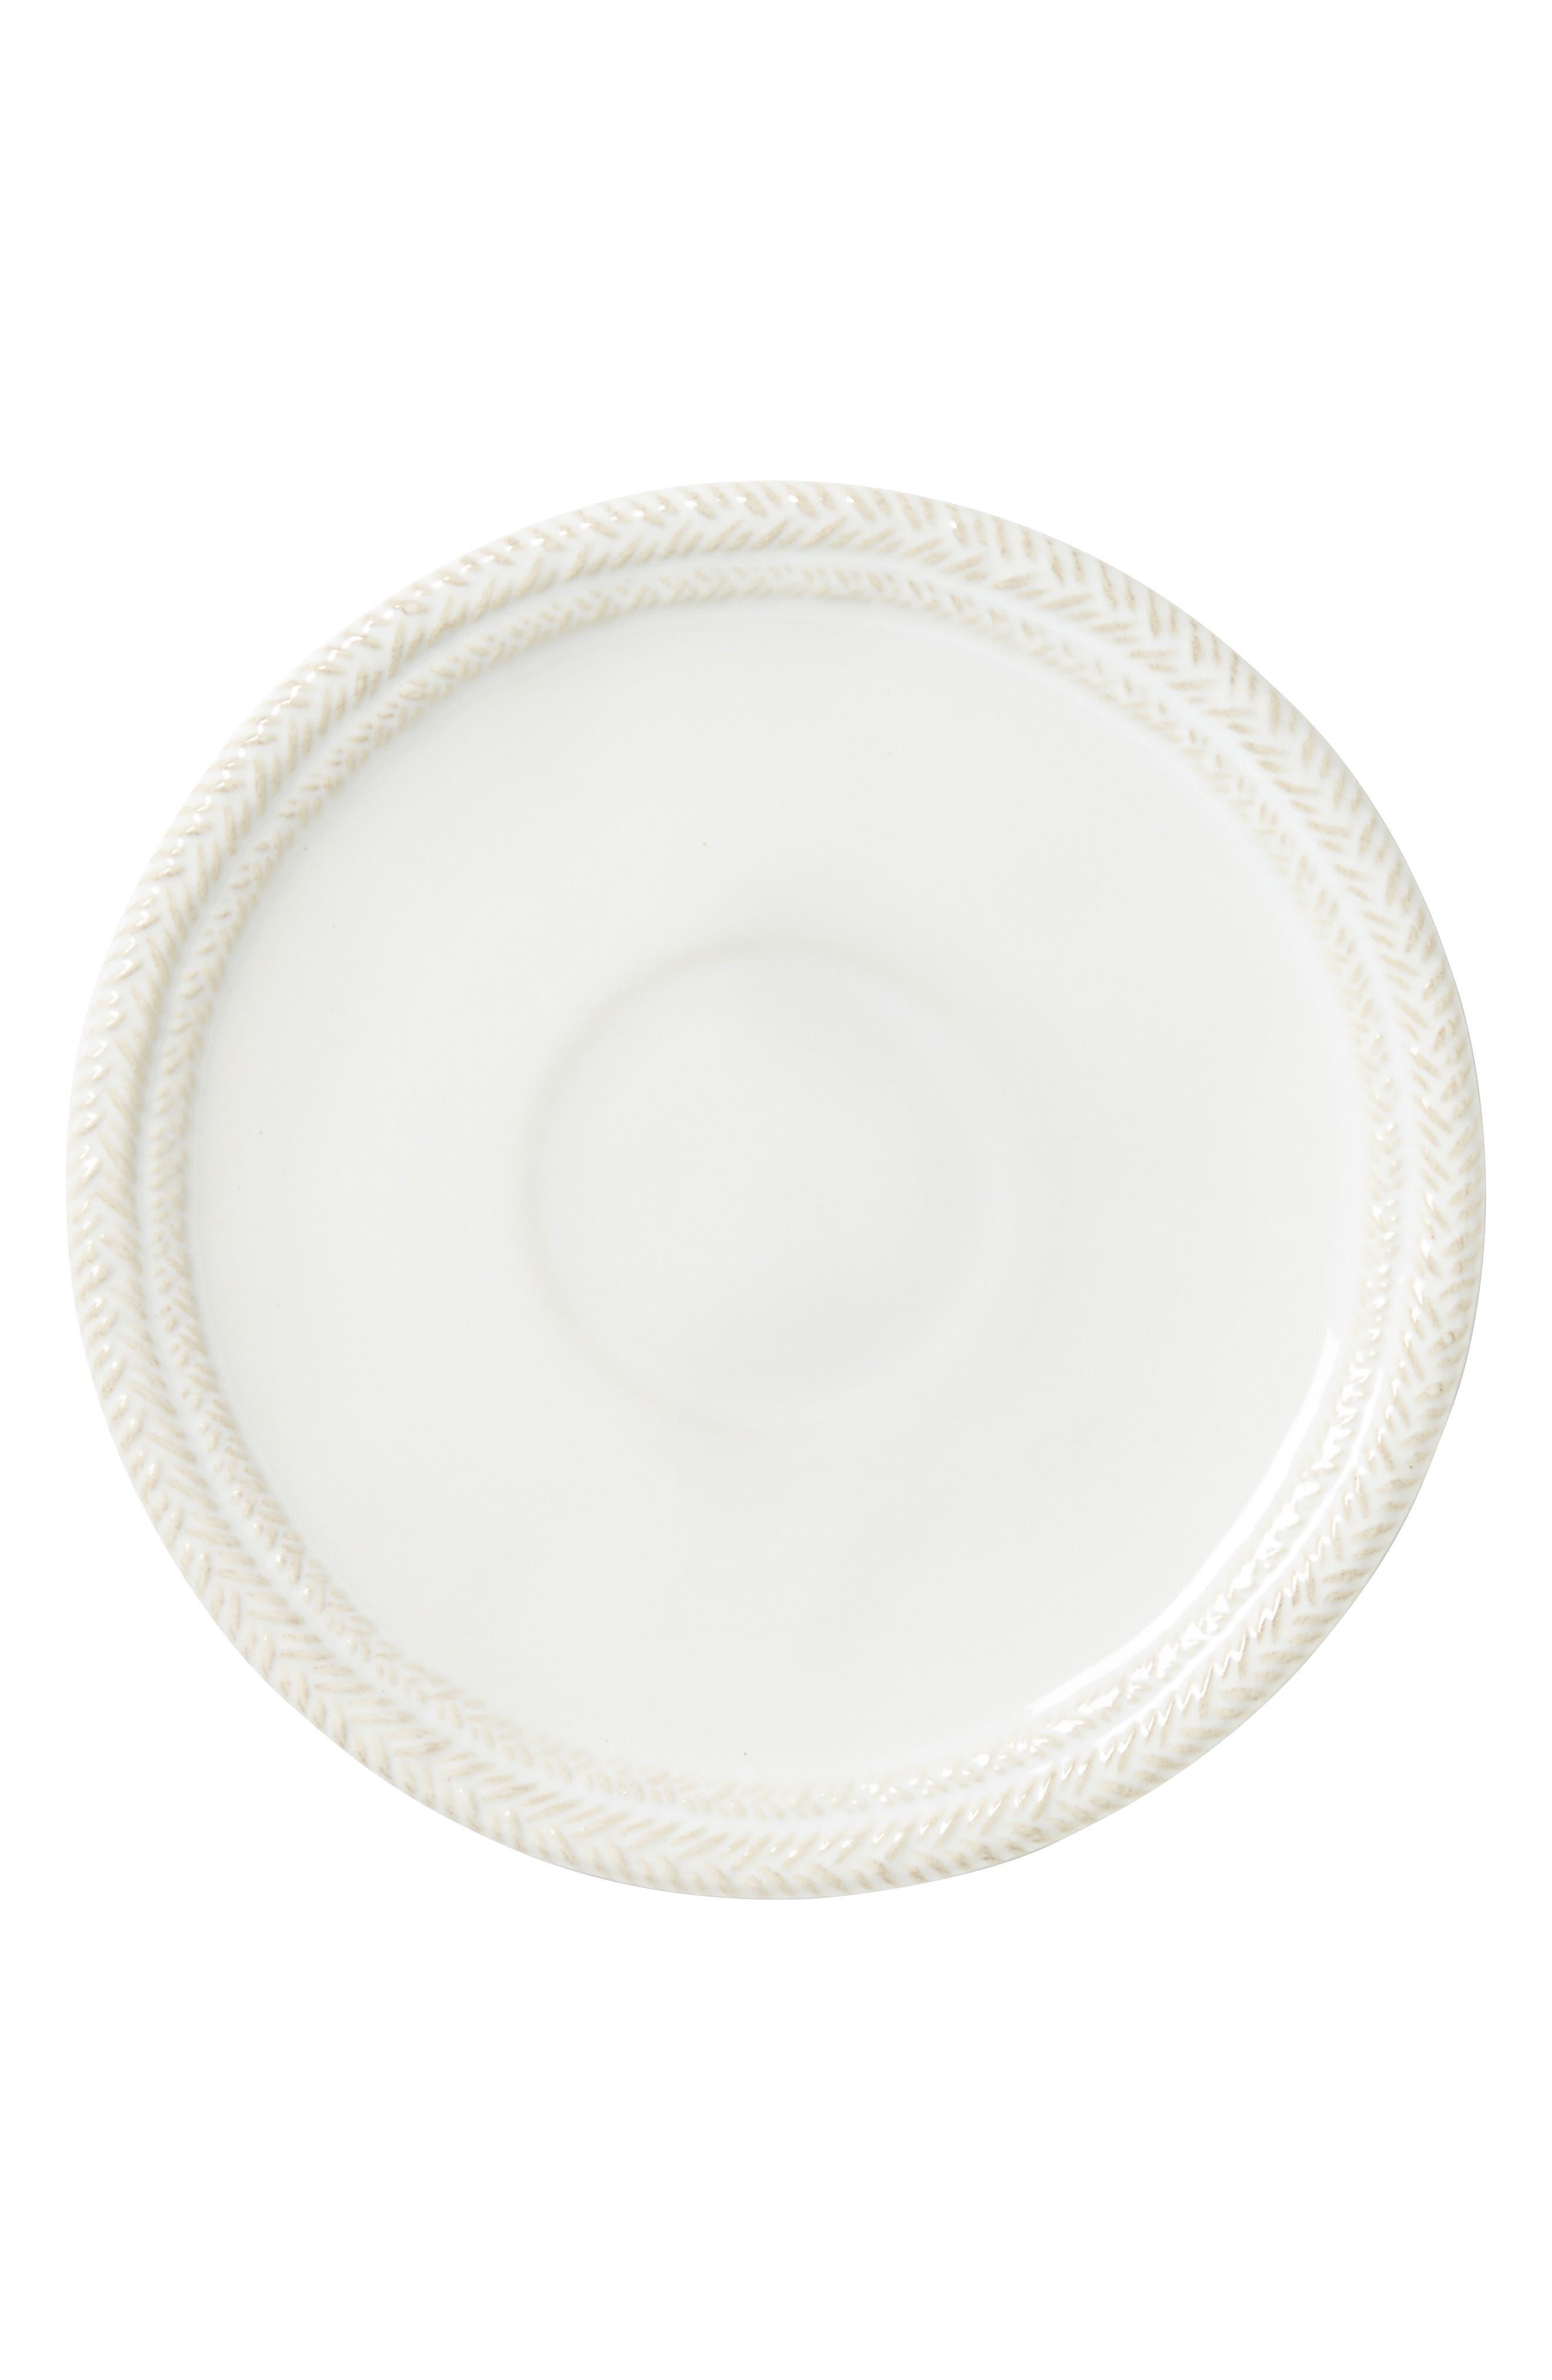 Le Panier Whitewash Saucer,                         Main,                         color, WHITEWASH